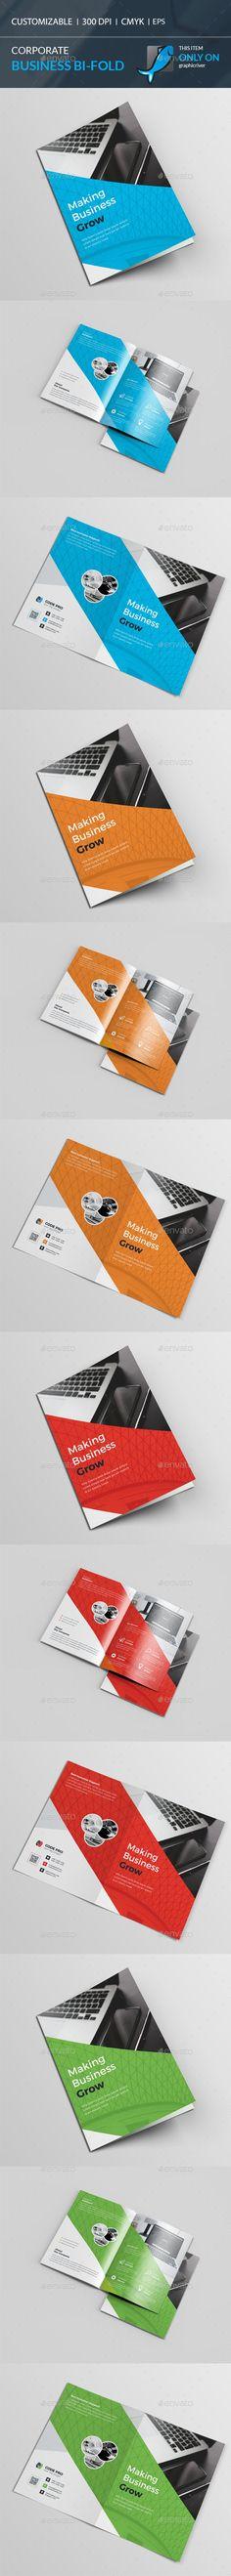 Square Bi Fold Brochure  Brochures Brochure Template And Ai